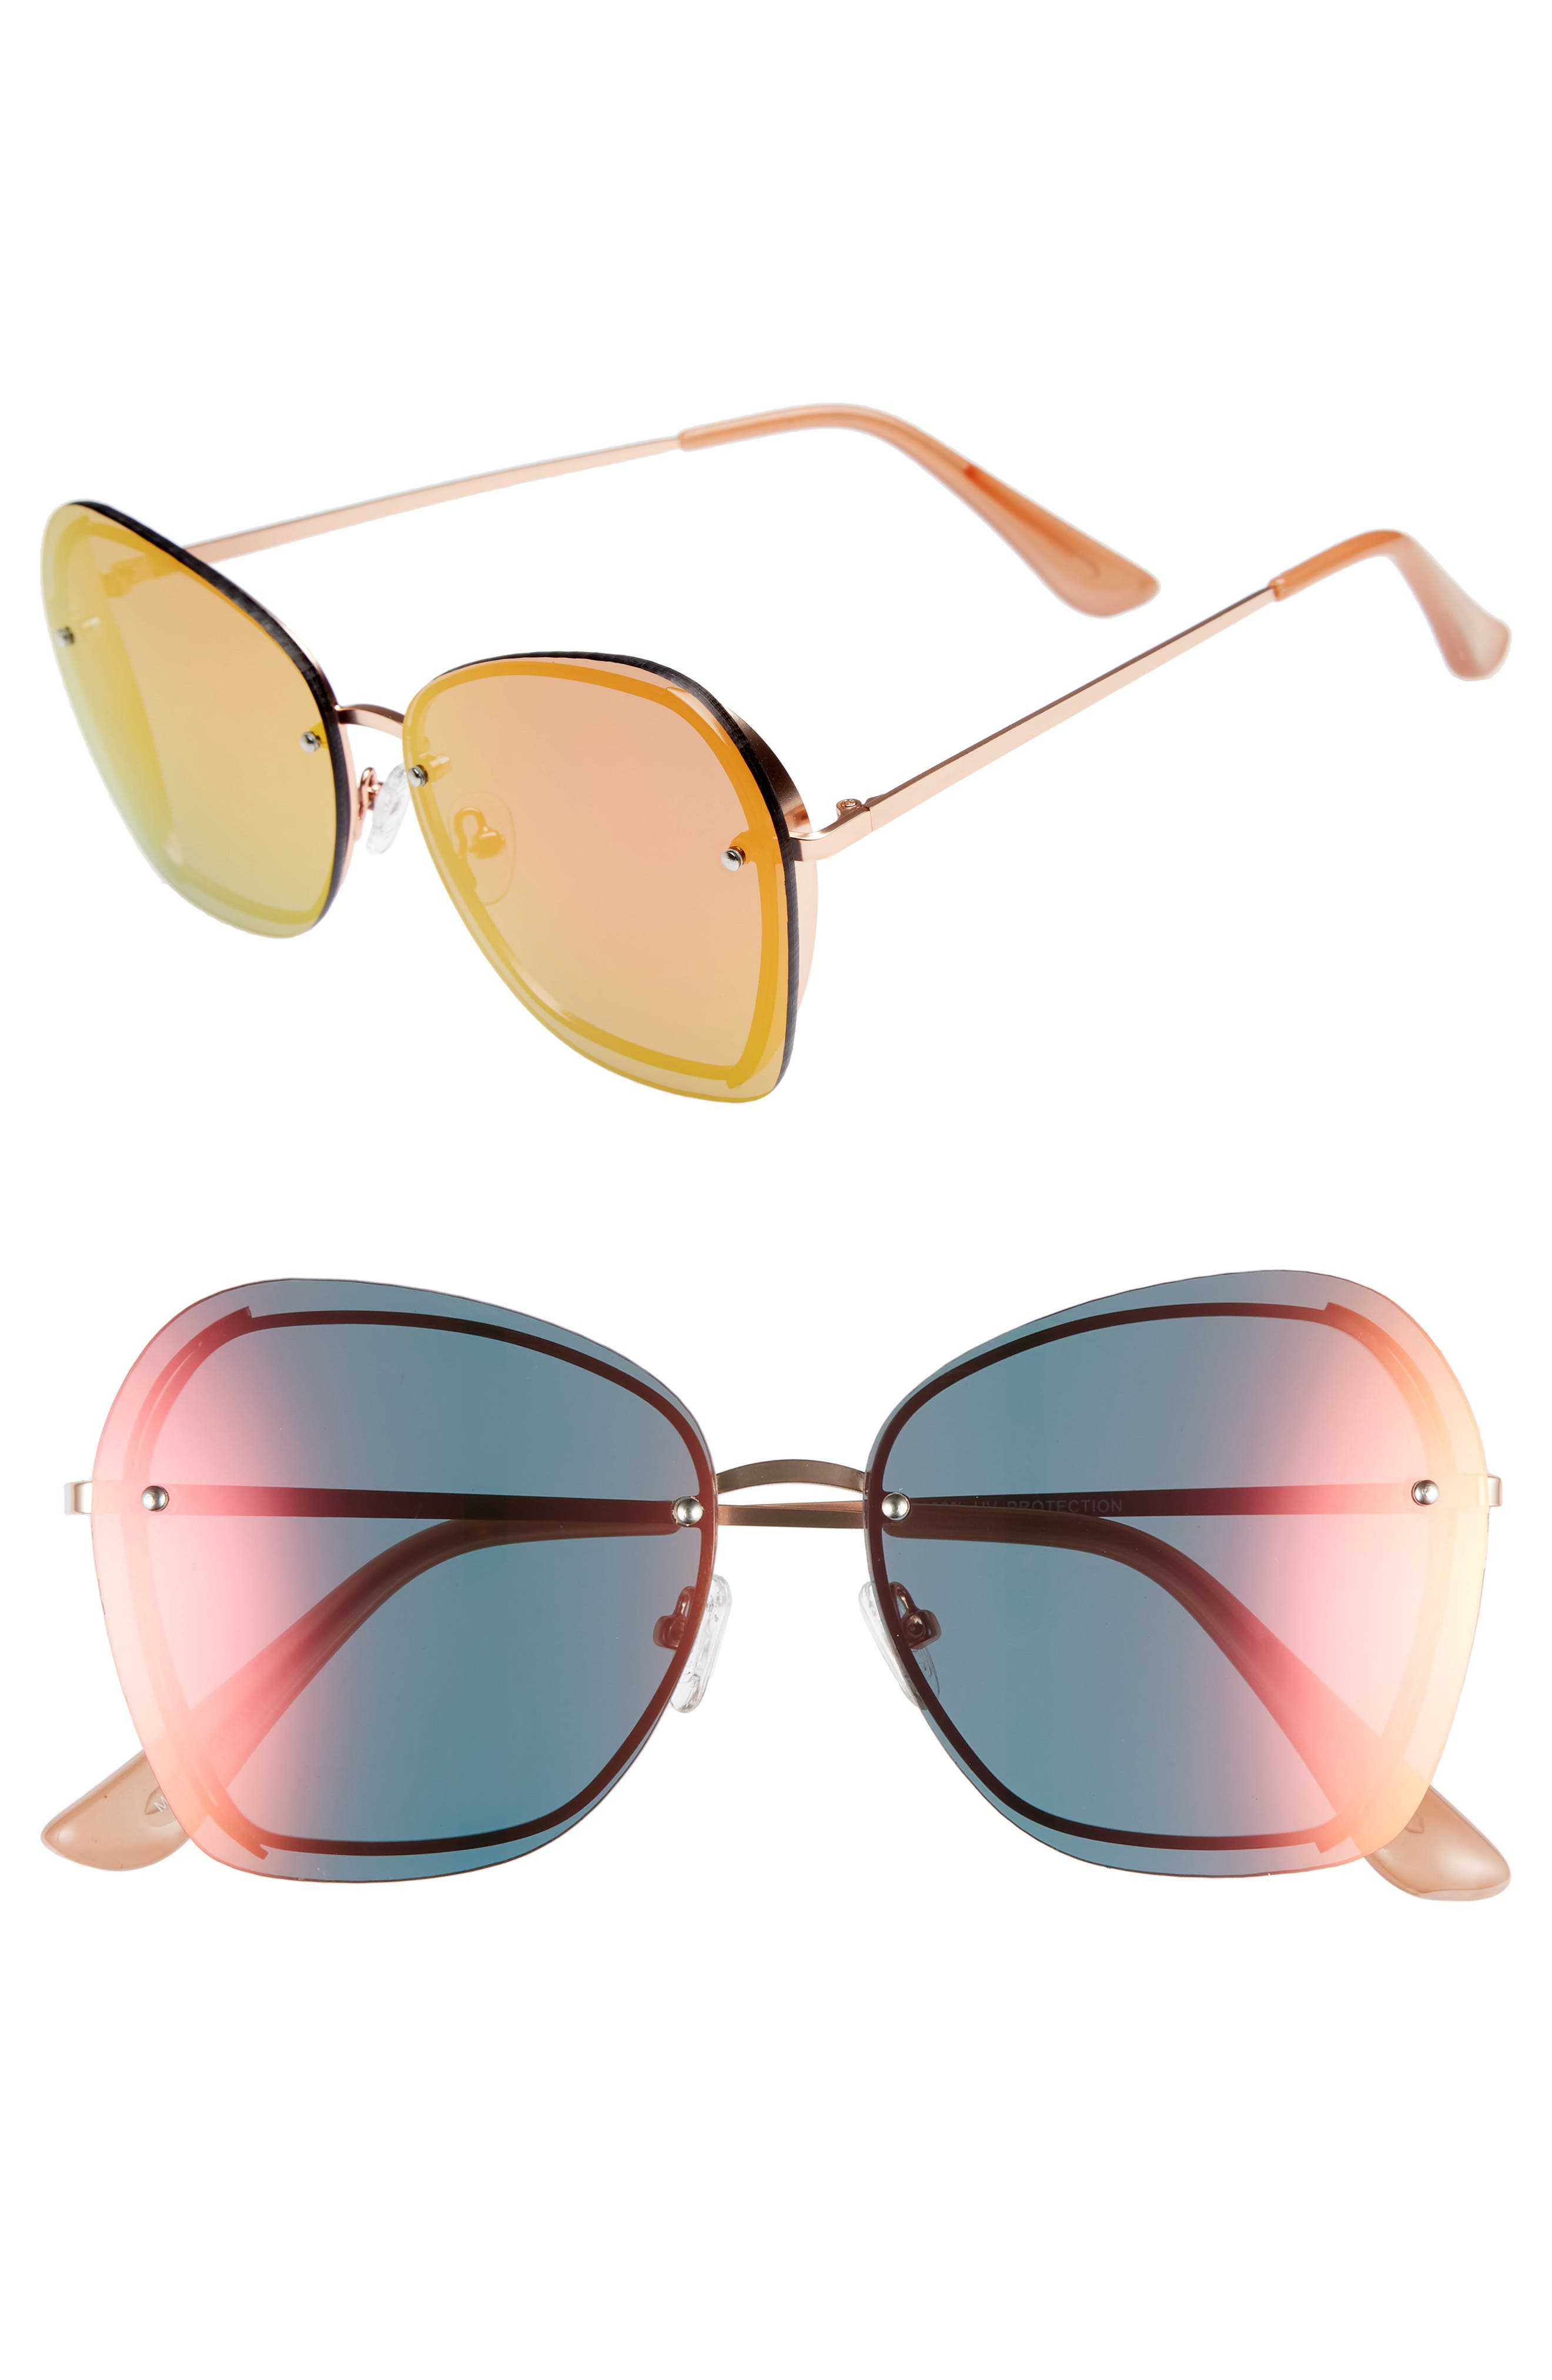 61mm Rimless Square Sunglasses,                         Main,                         color, Rose Gold/ Rose Gold